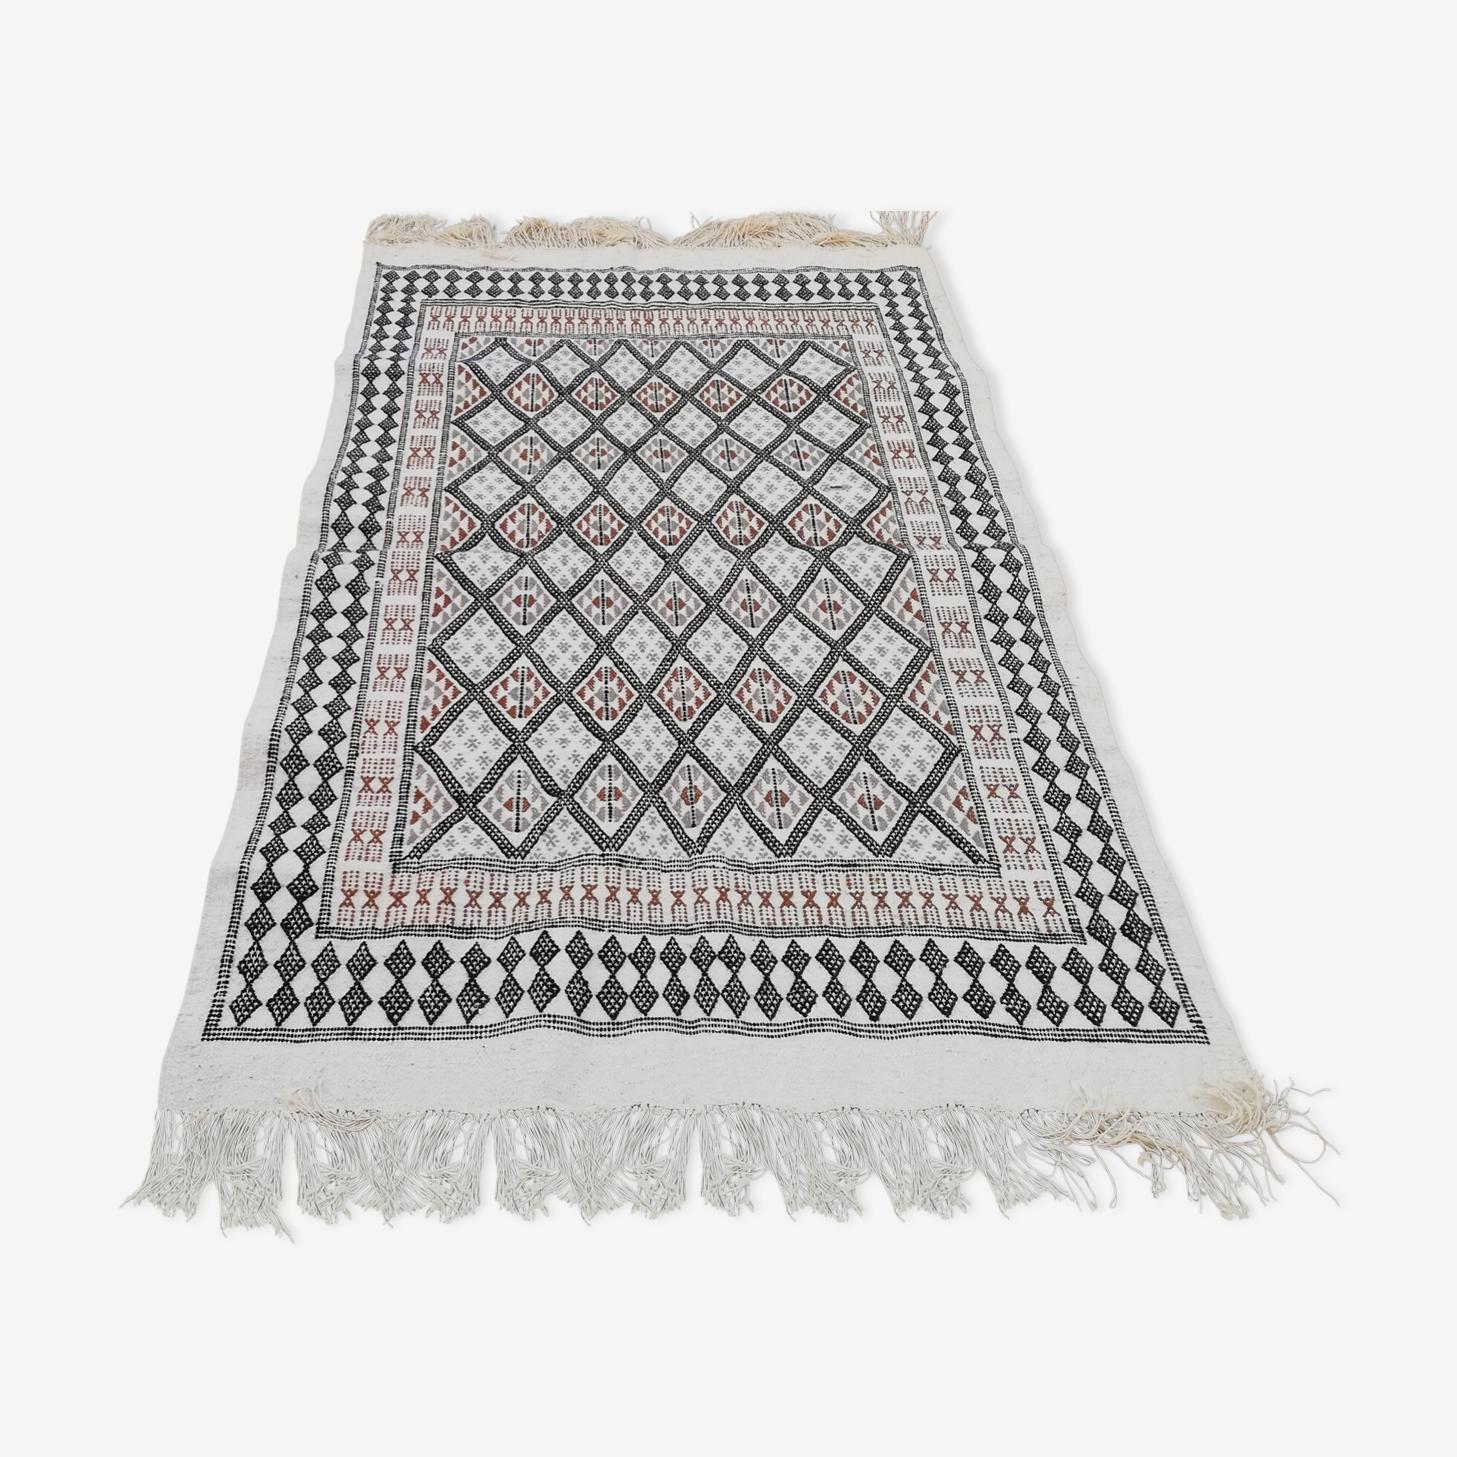 Moroccan kilim white and grey carpet 198x123cm